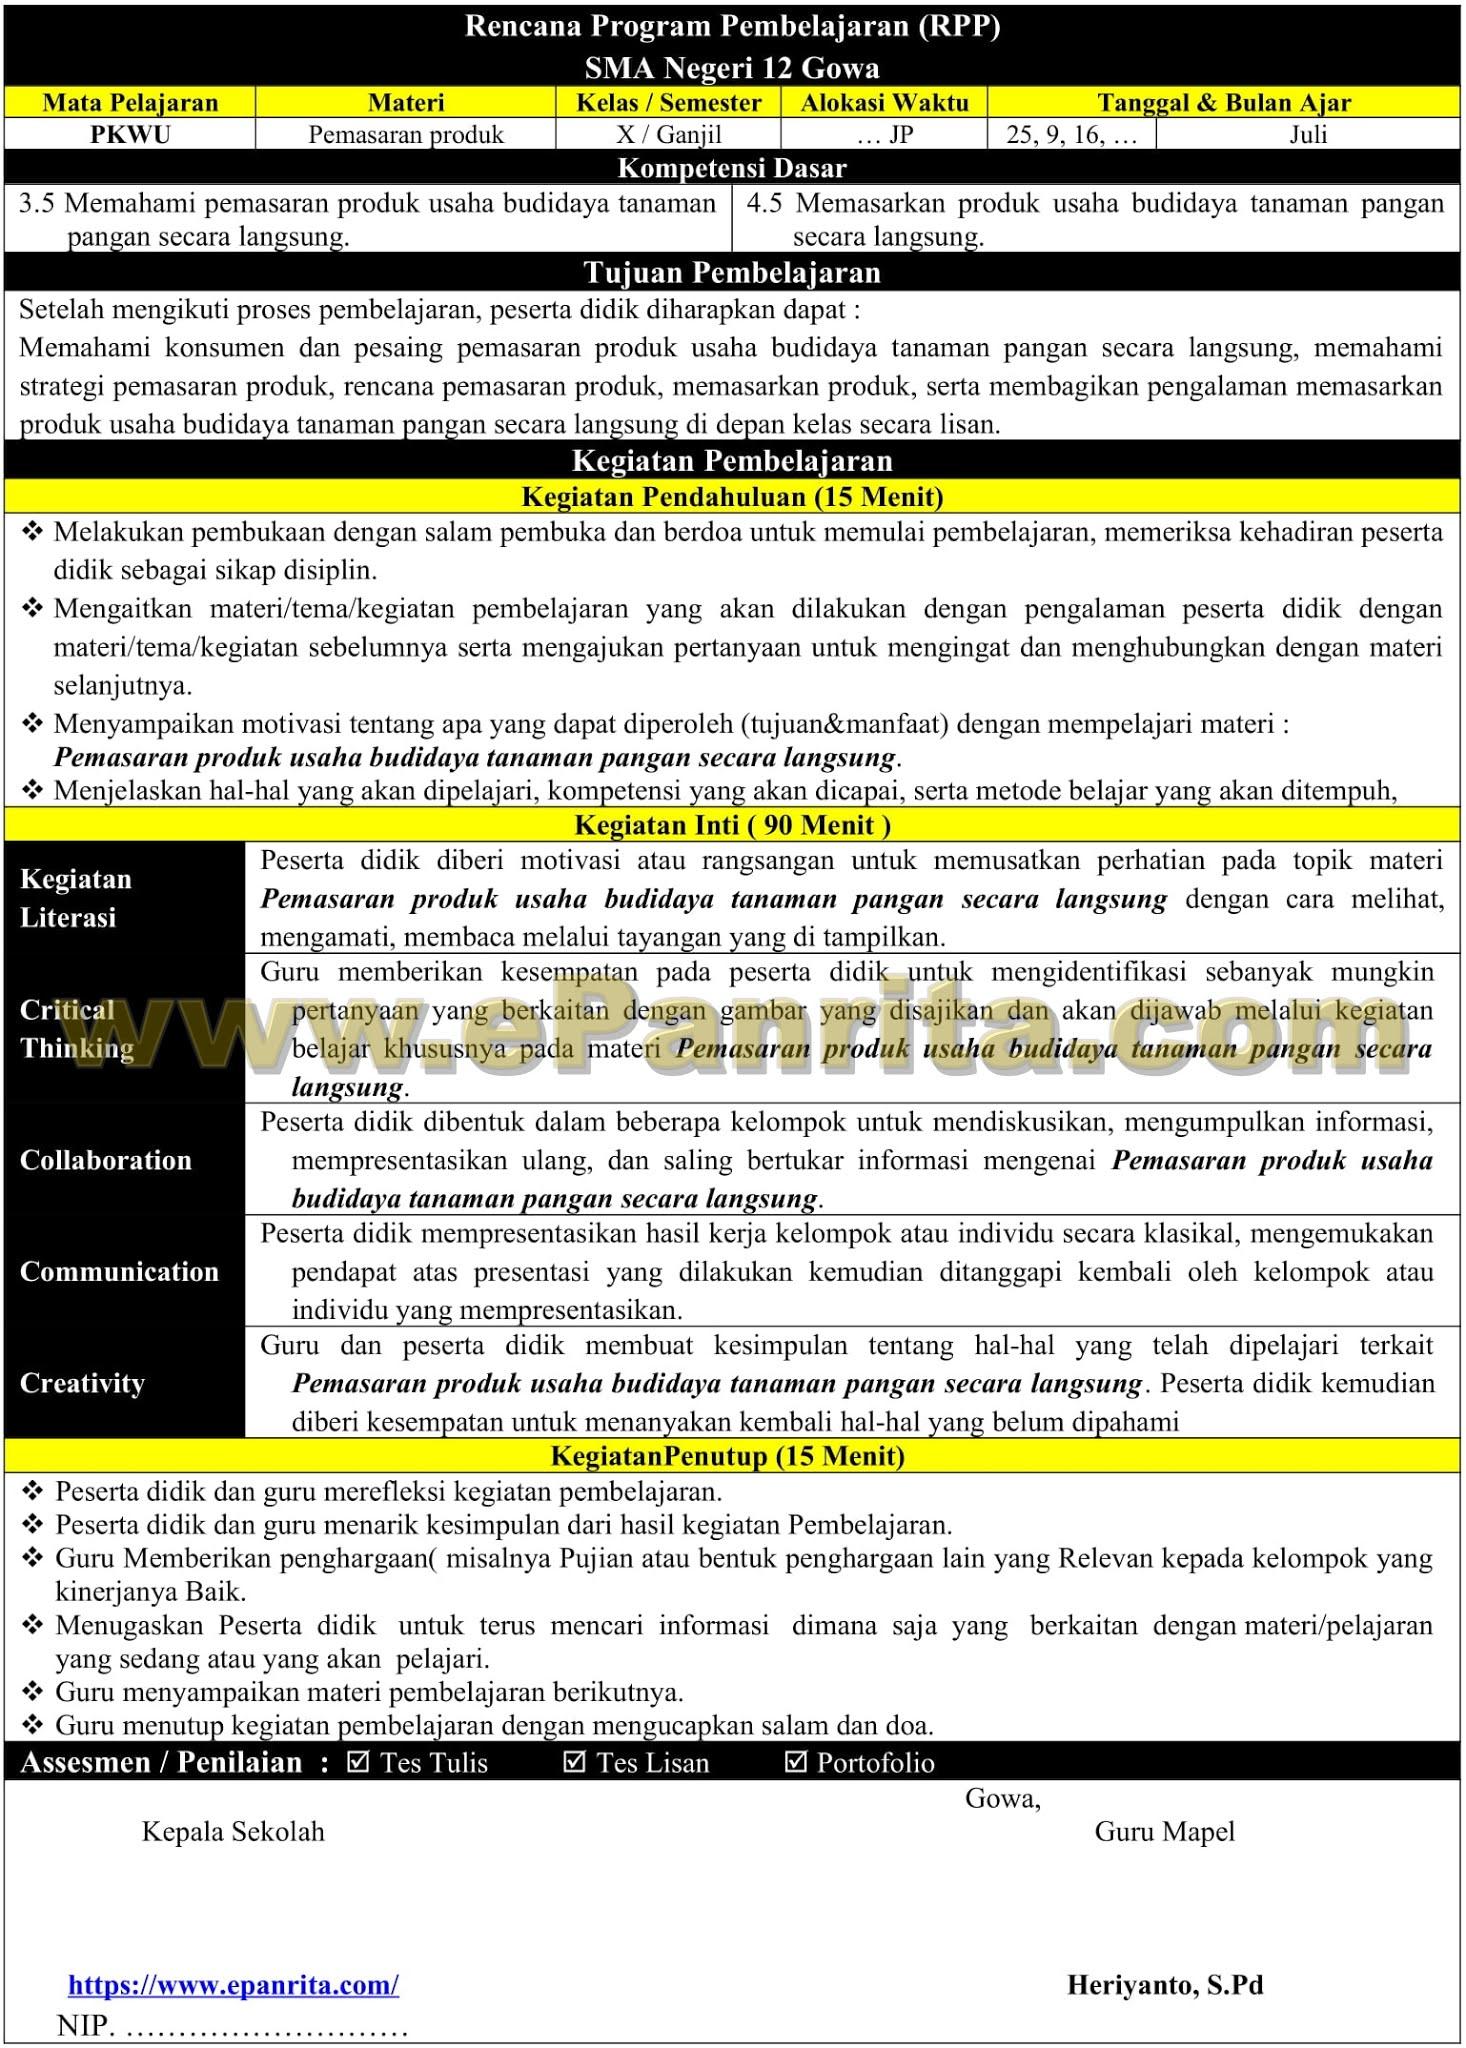 RPP 1 Halaman Prakarya Aspek Budidaya (Pemasaran produk usaha budidaya tanaman pangan secara langsung)